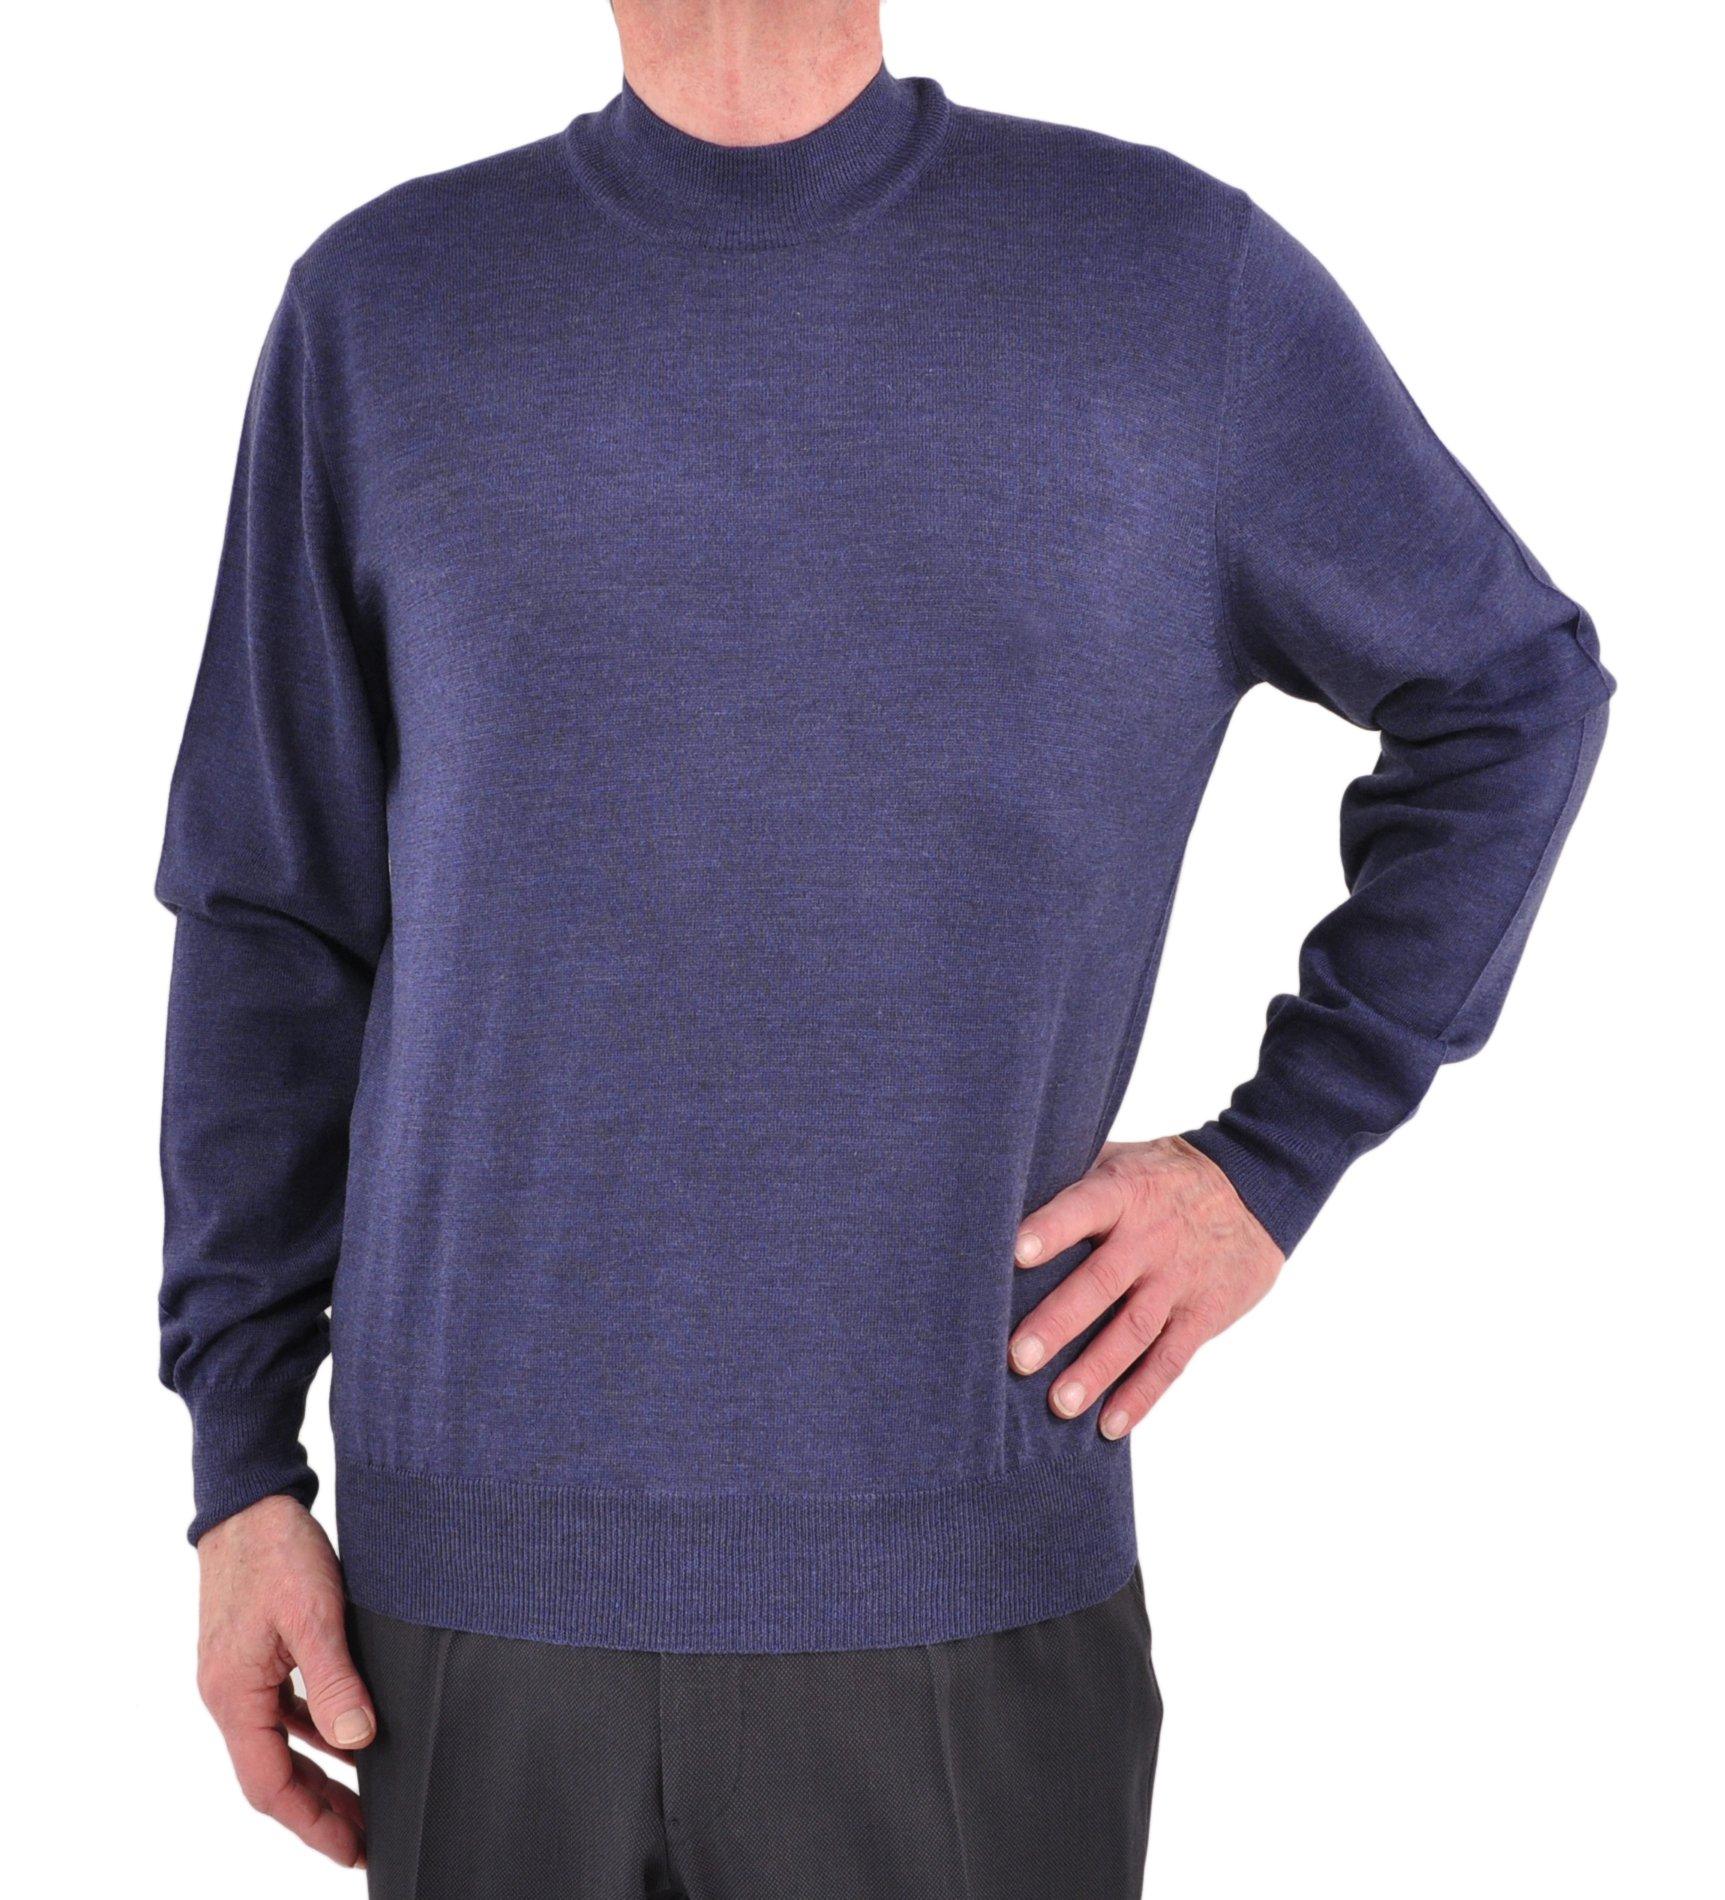 Gran Sasso Extrafine Merino Wool Mock Turtleneck Sweater Medium/Postman Blue by GranSasso (Image #2)